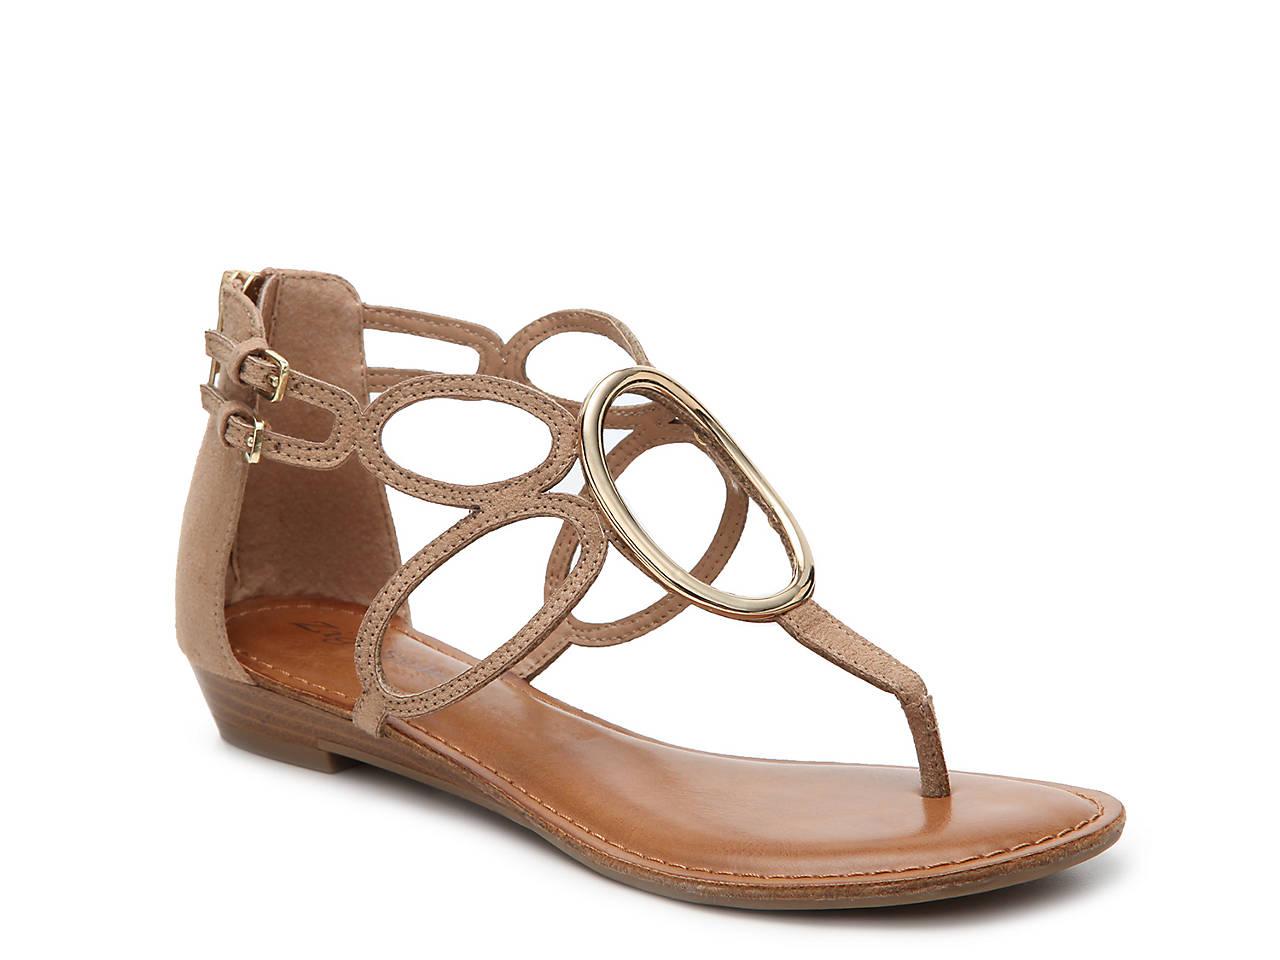 37a5e410606c Zigi Soho Markah Flat Sandal Women s Shoes